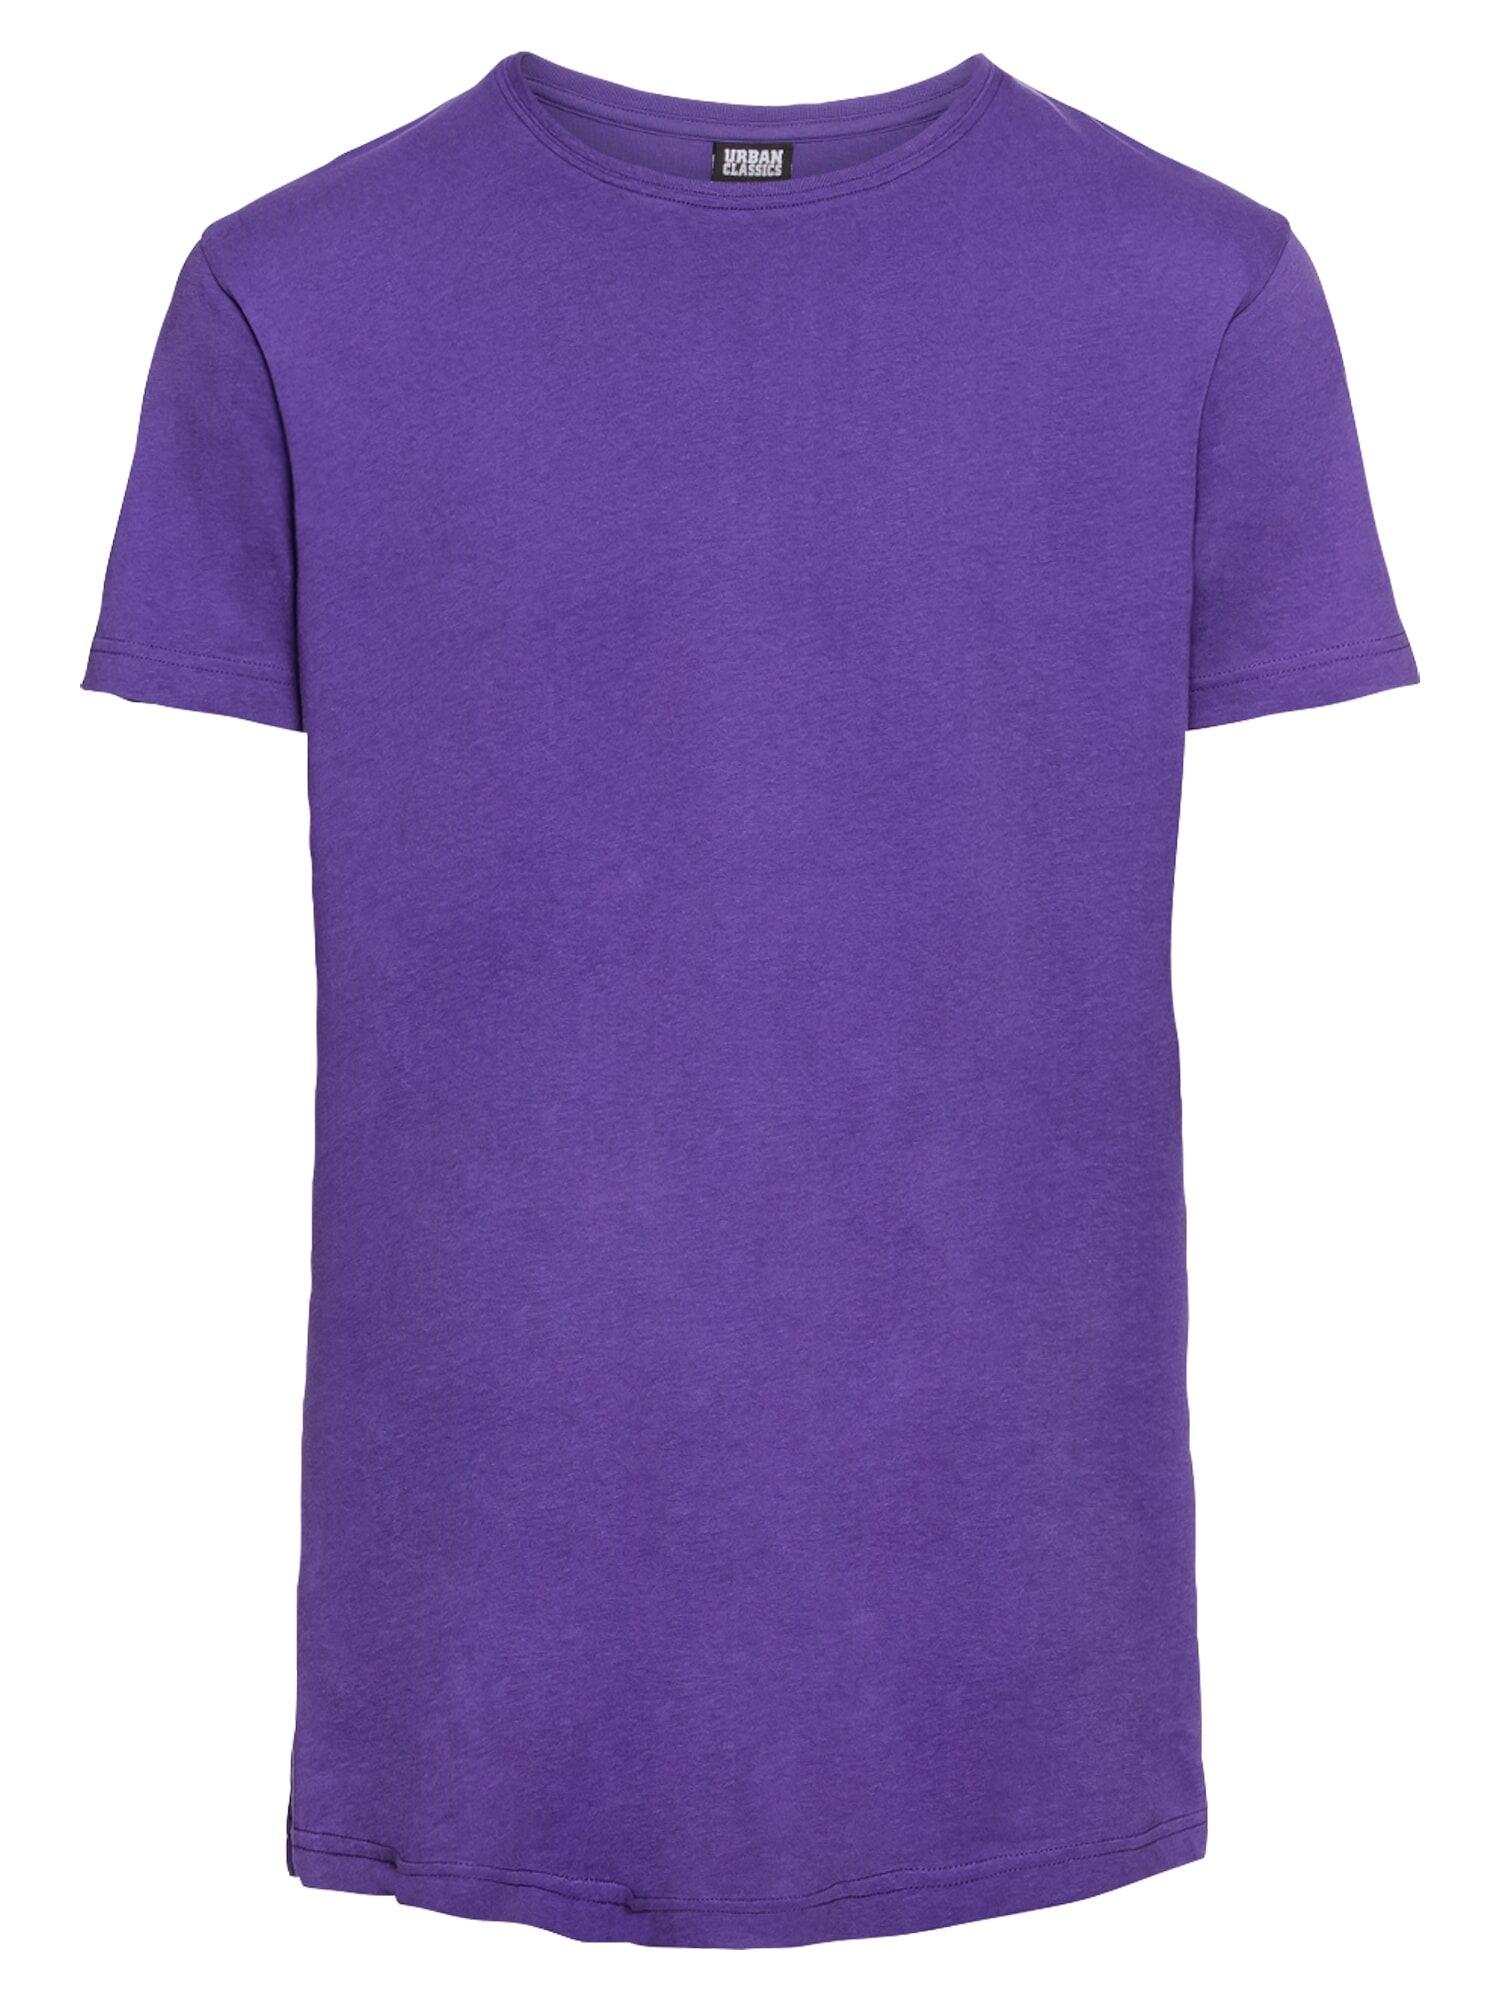 Urban Classics T-Shirt  - Violet - Taille: L - male